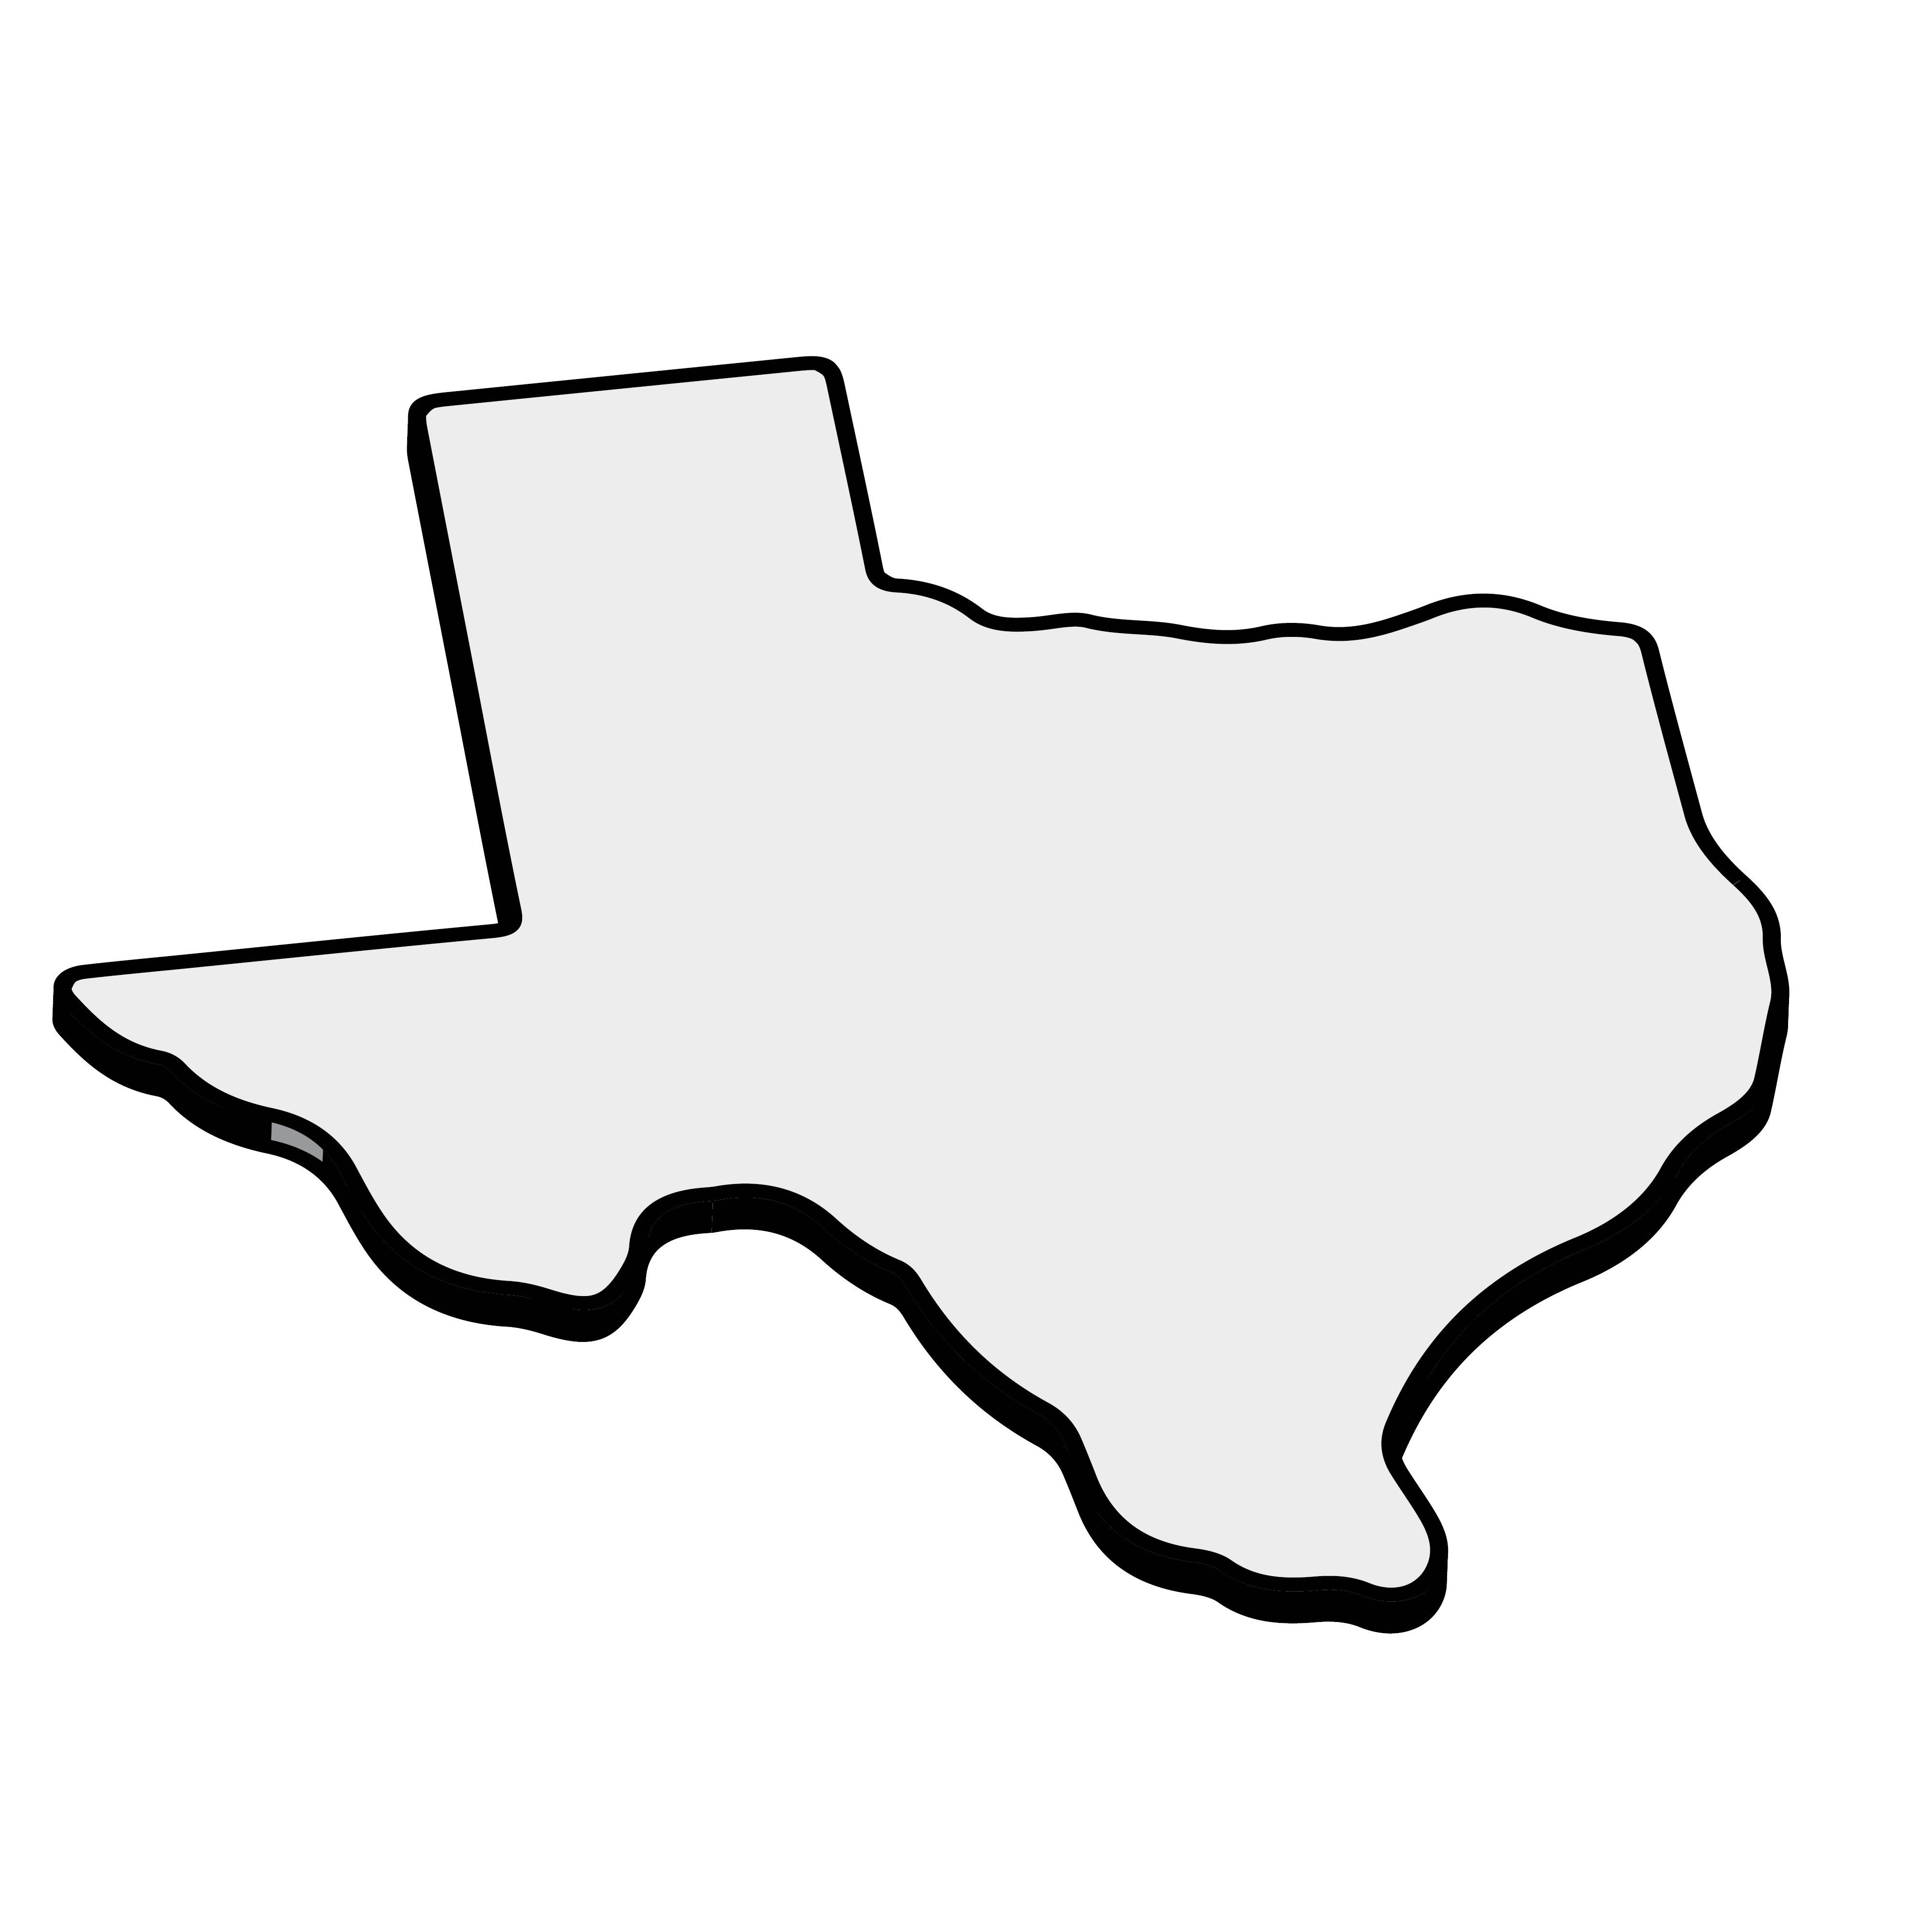 Texas Outline Clip Art